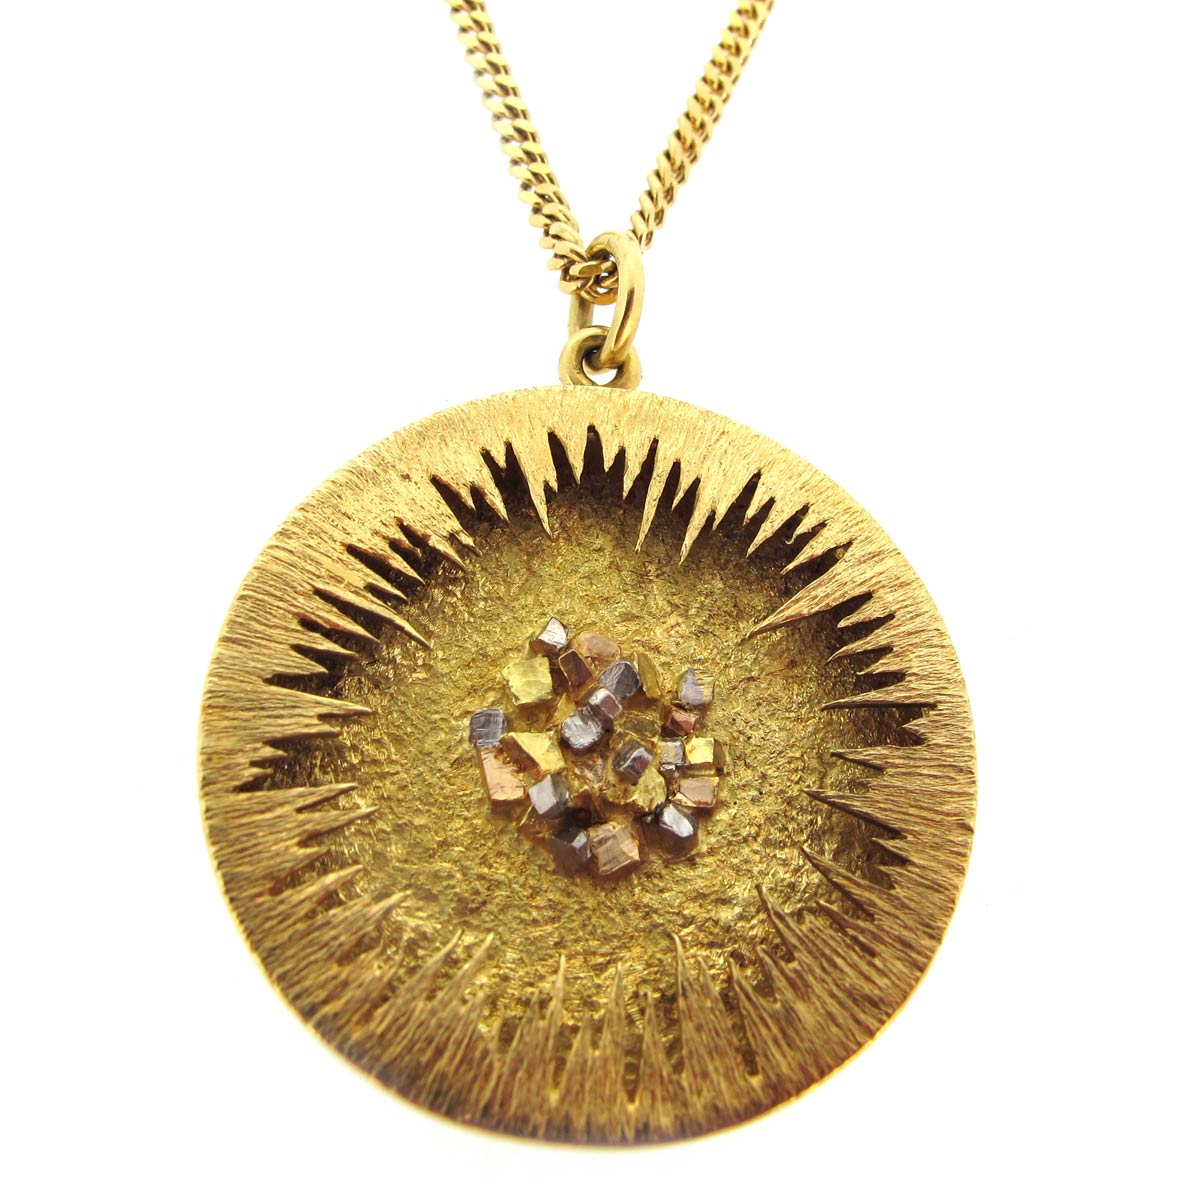 Gold 'Pot Of Gold' Pendant